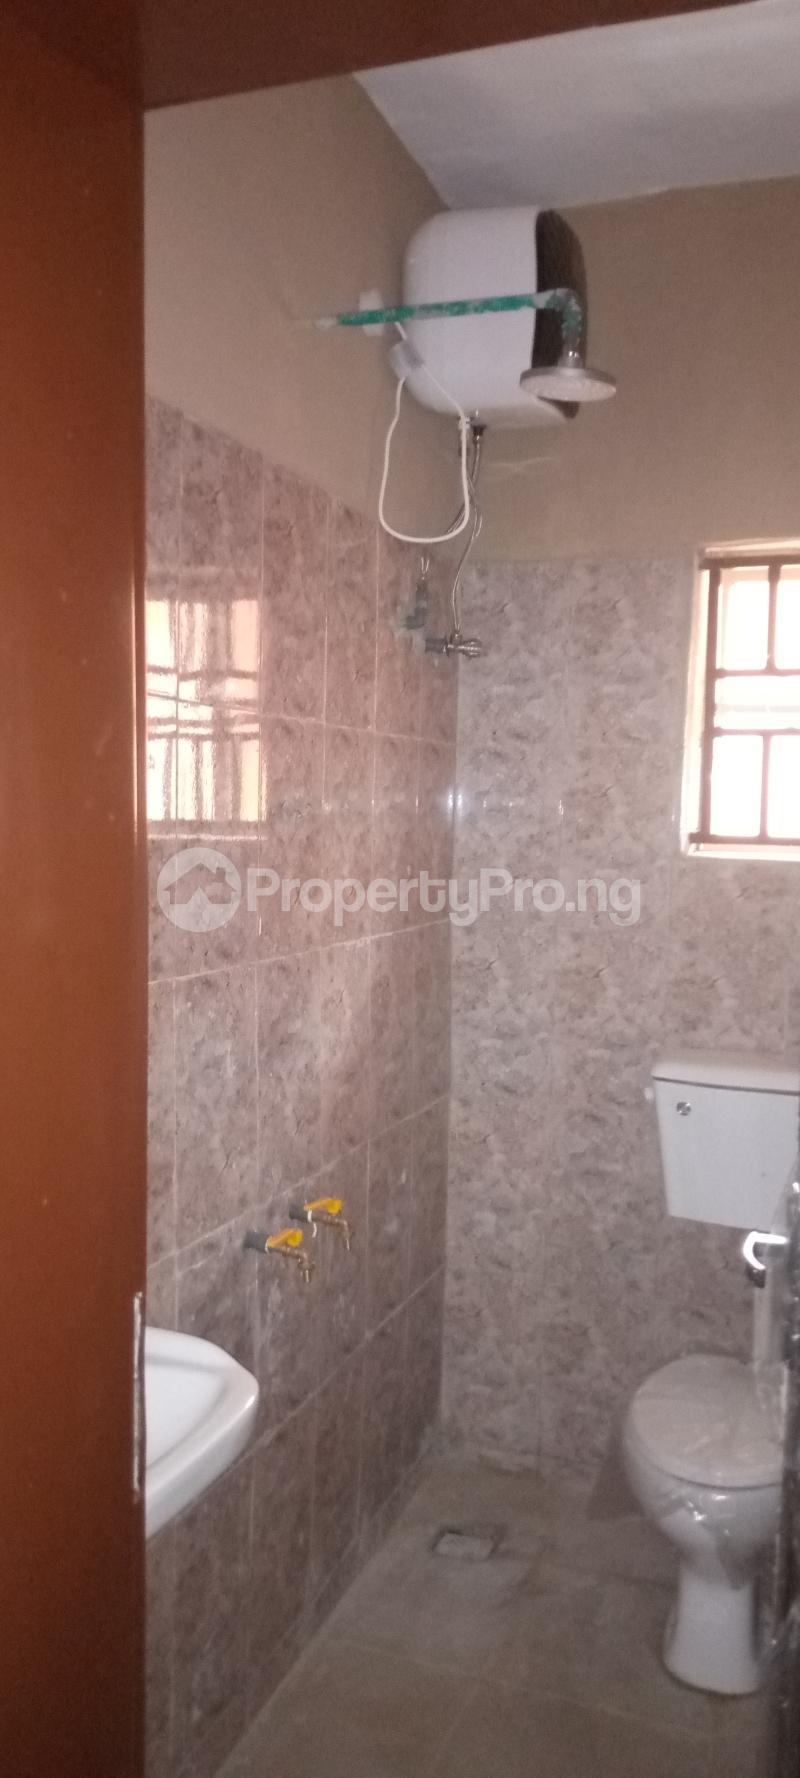 3 bedroom Blocks of Flats House for rent Basin area Ilorin Kwara - 4